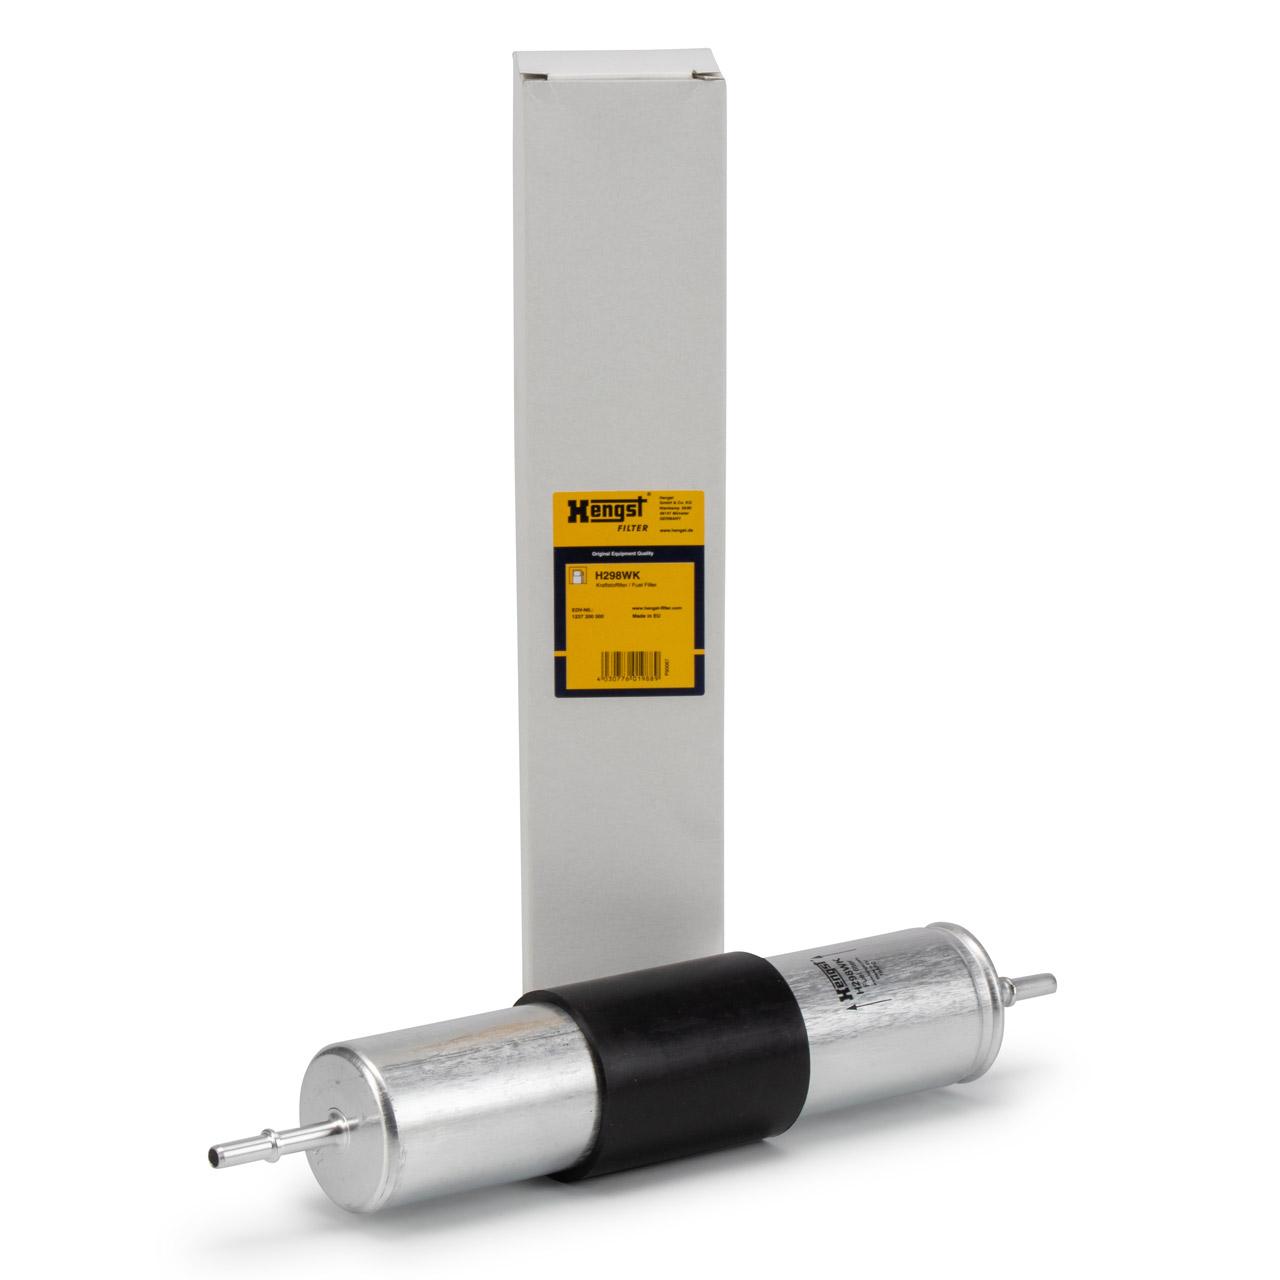 HENGST H298WK Kraftstofffilter für BMW 3er E36 M3 3.0 286/295 PS + M3 3.2 321 PS